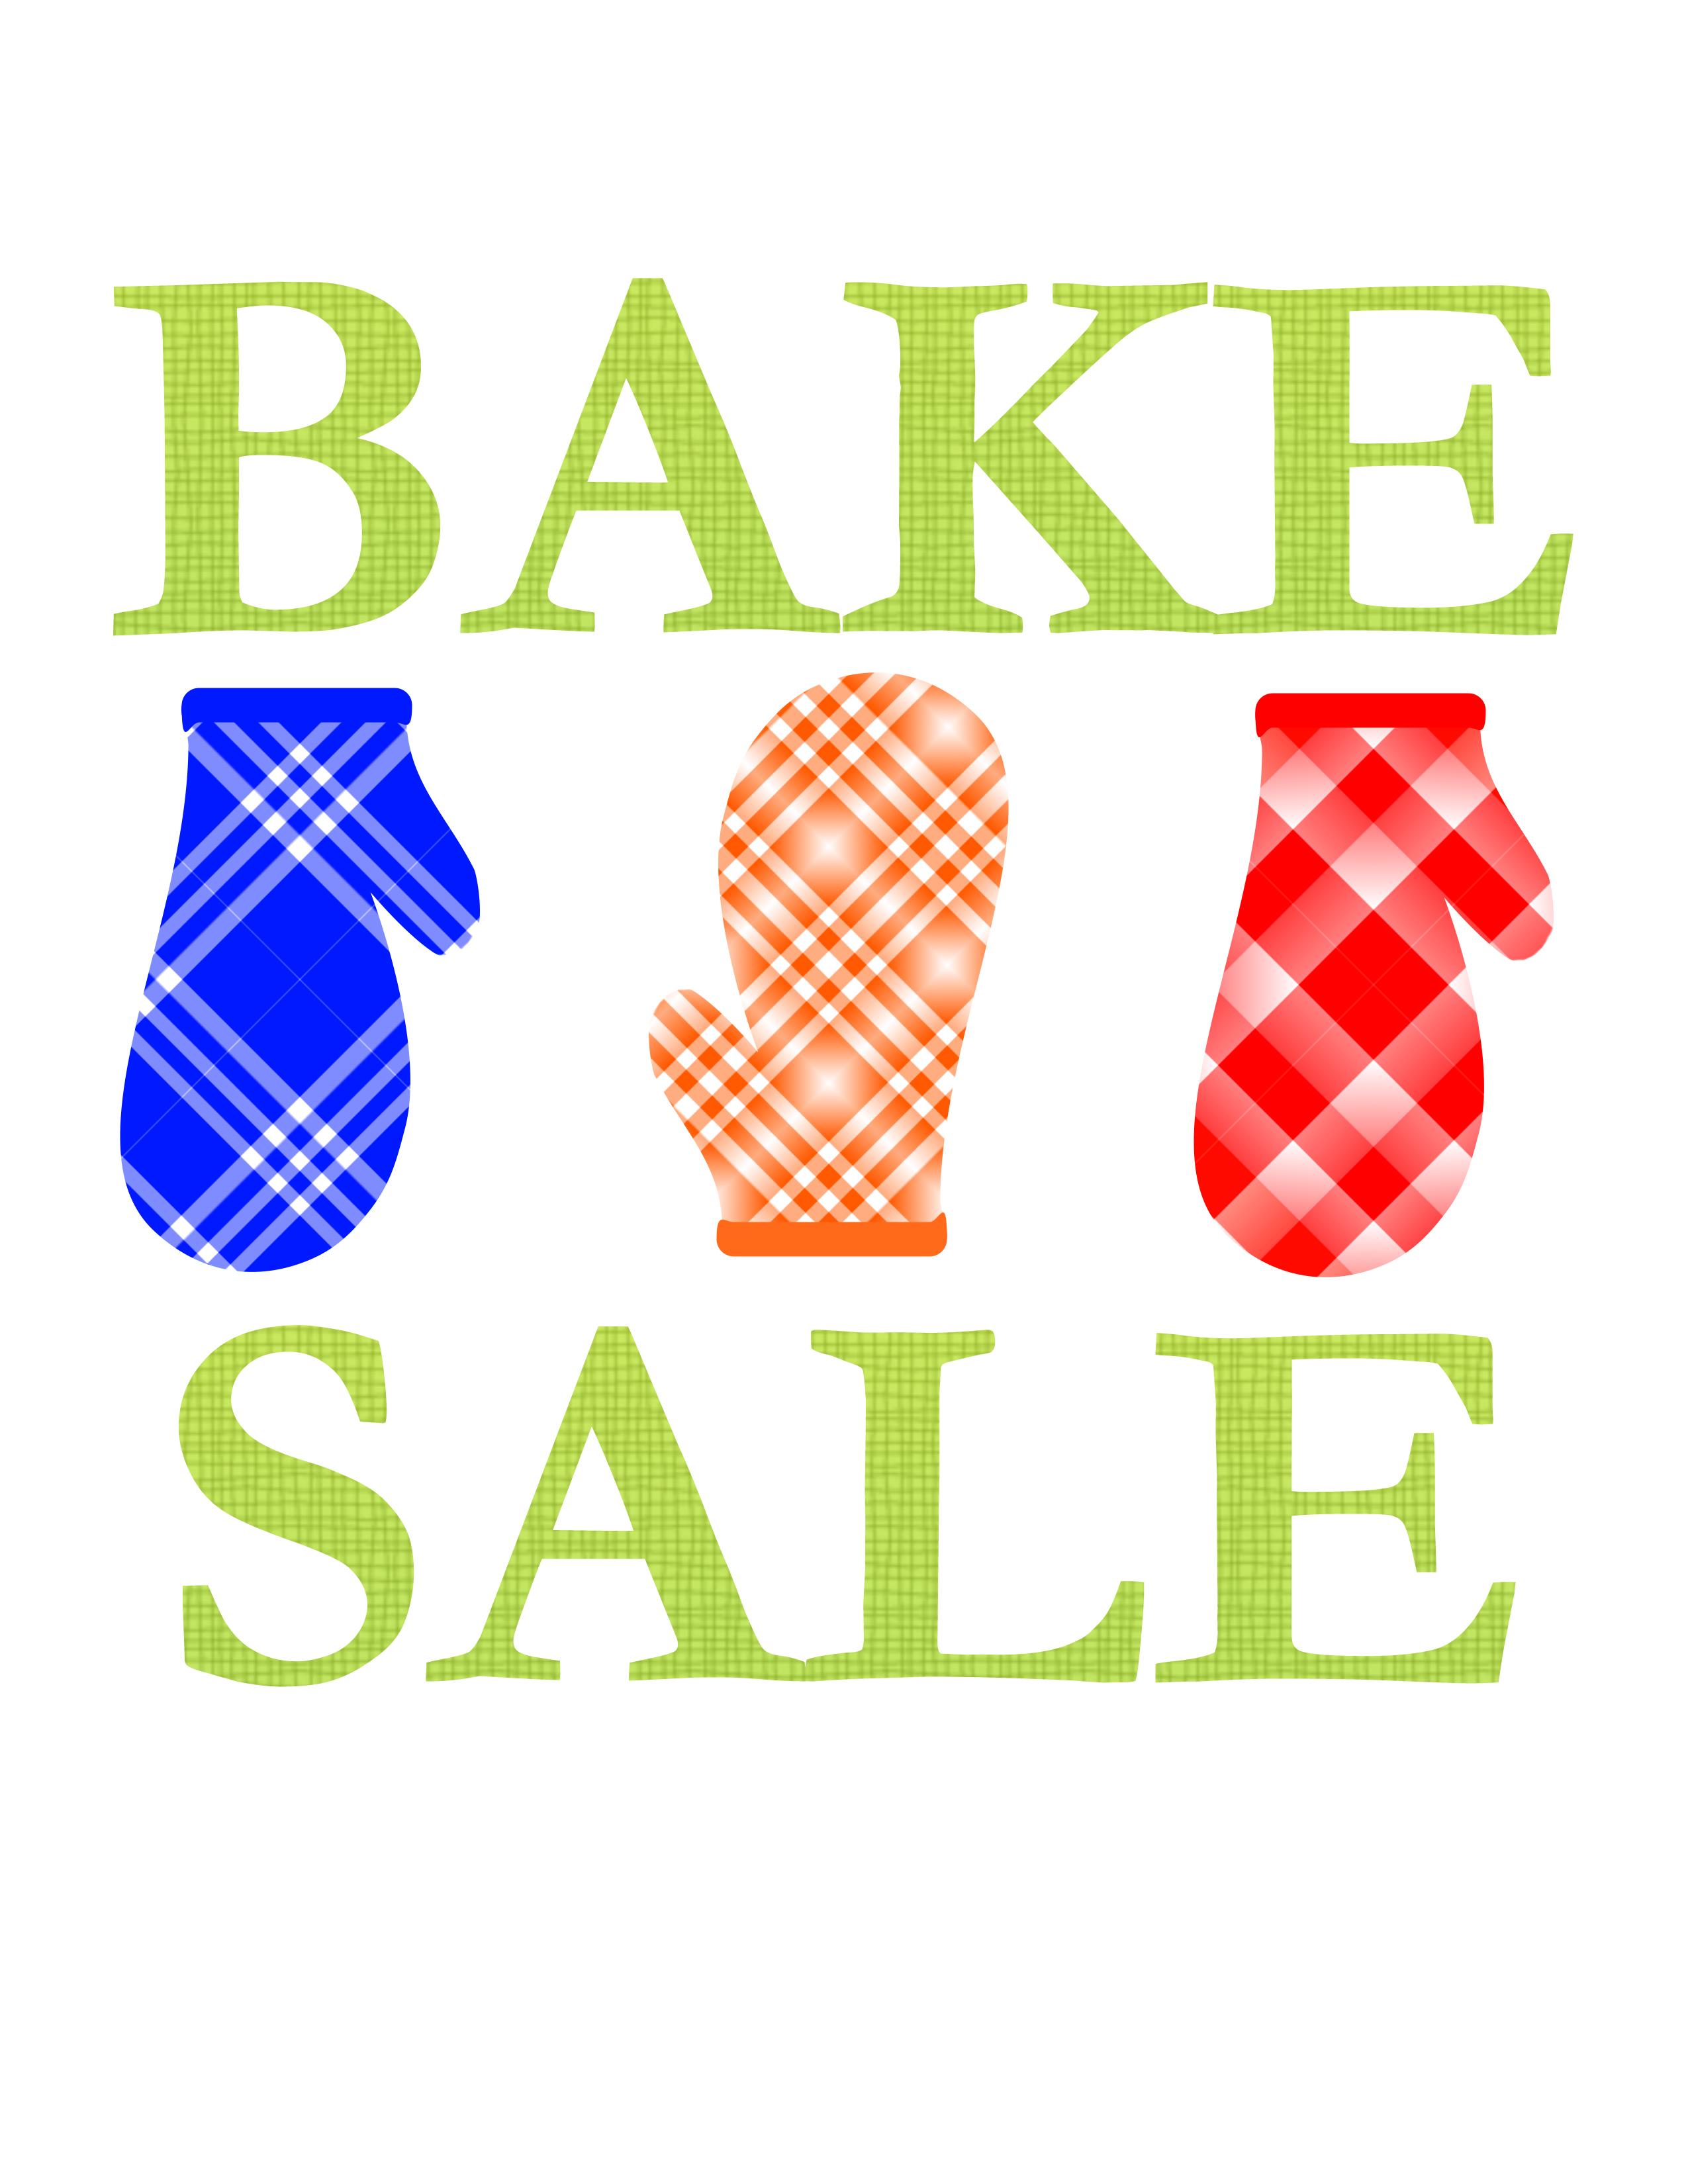 Wendsday sale clipart banner transparent download Free Bake Sale Clipart, Download Free Clip Art, Free Clip ... banner transparent download